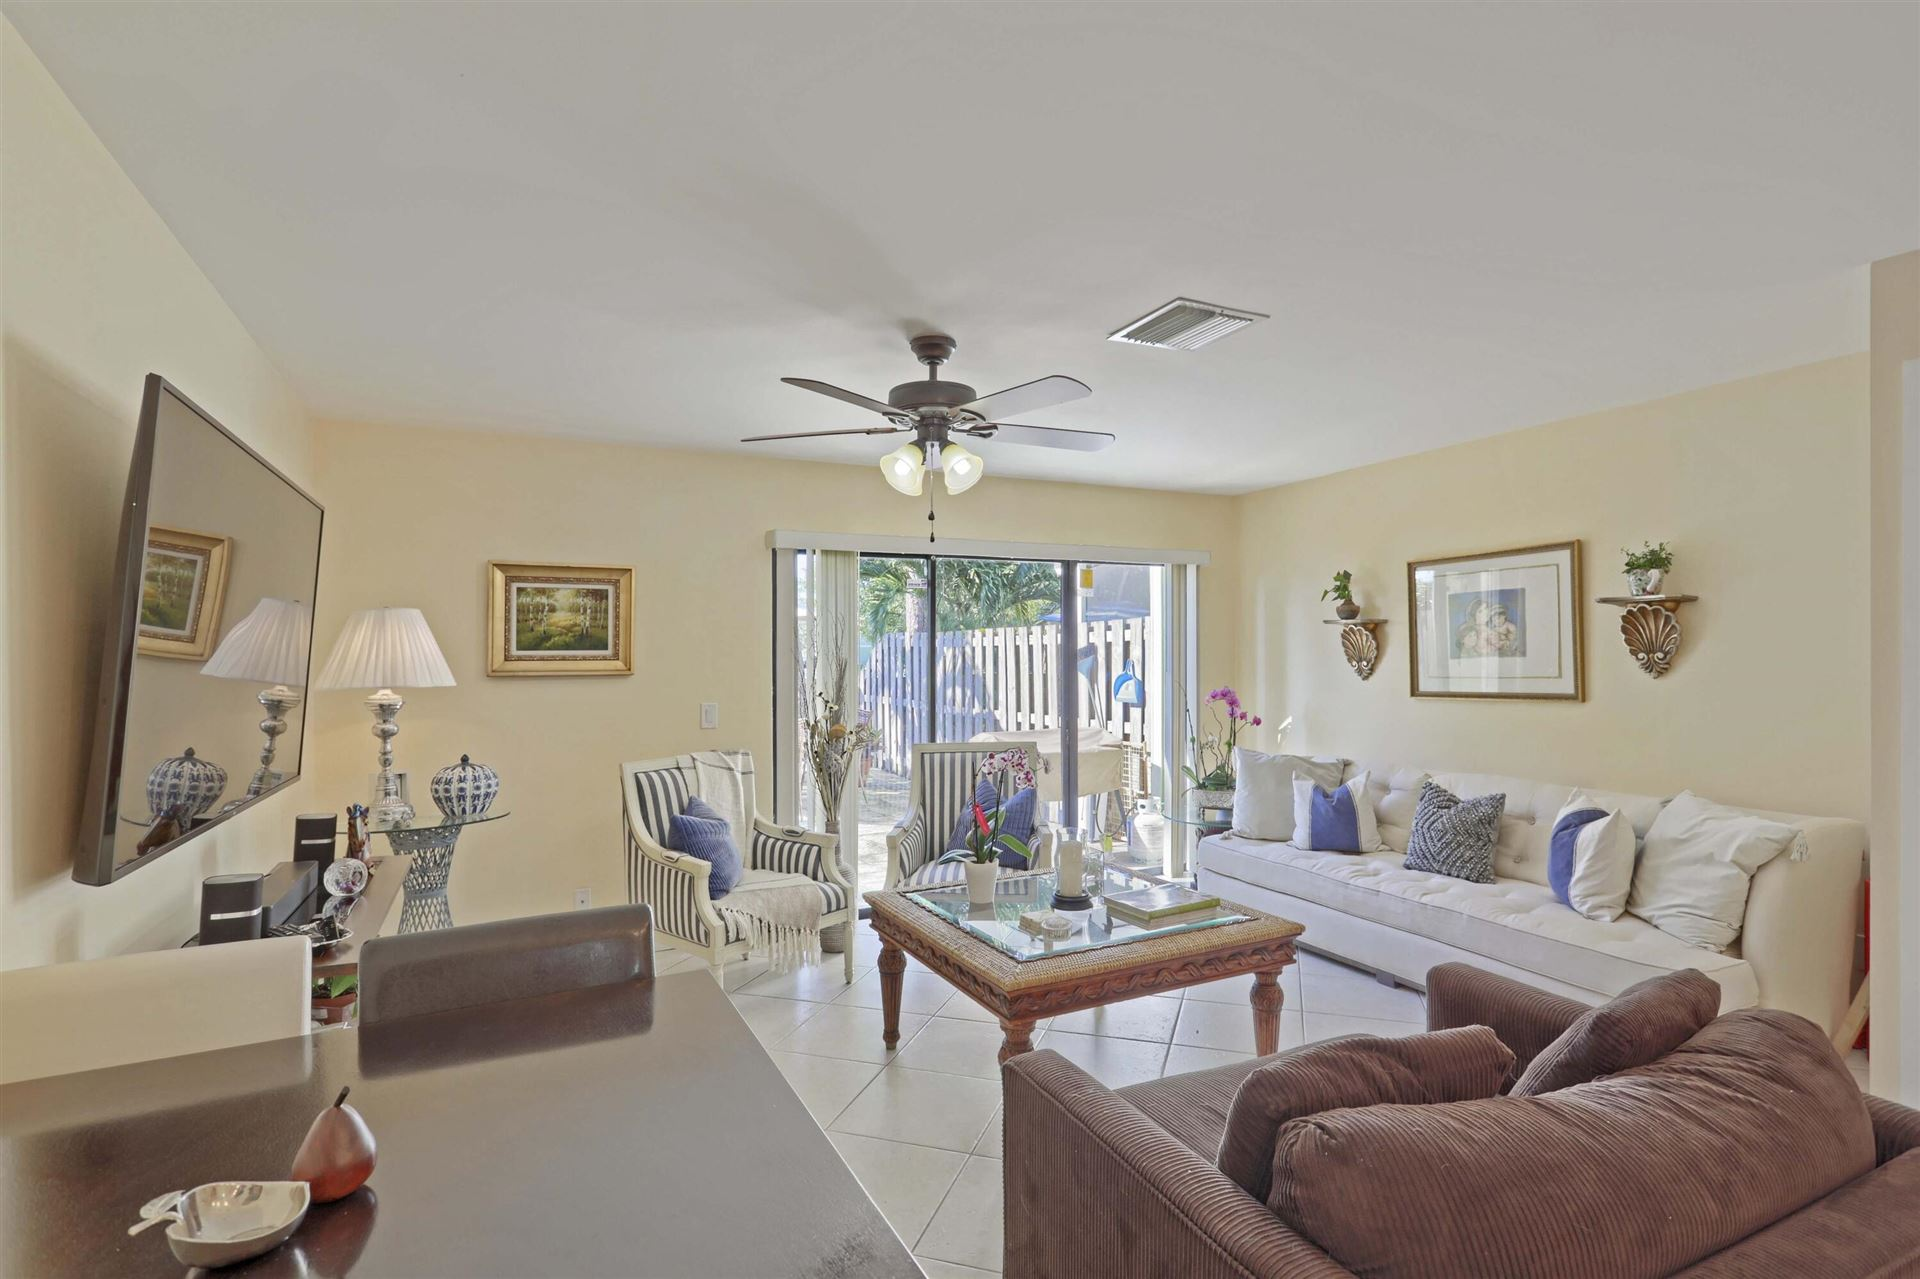 5022 Society Place E #C, West Palm Beach, FL 33415 - MLS#: RX-10748176